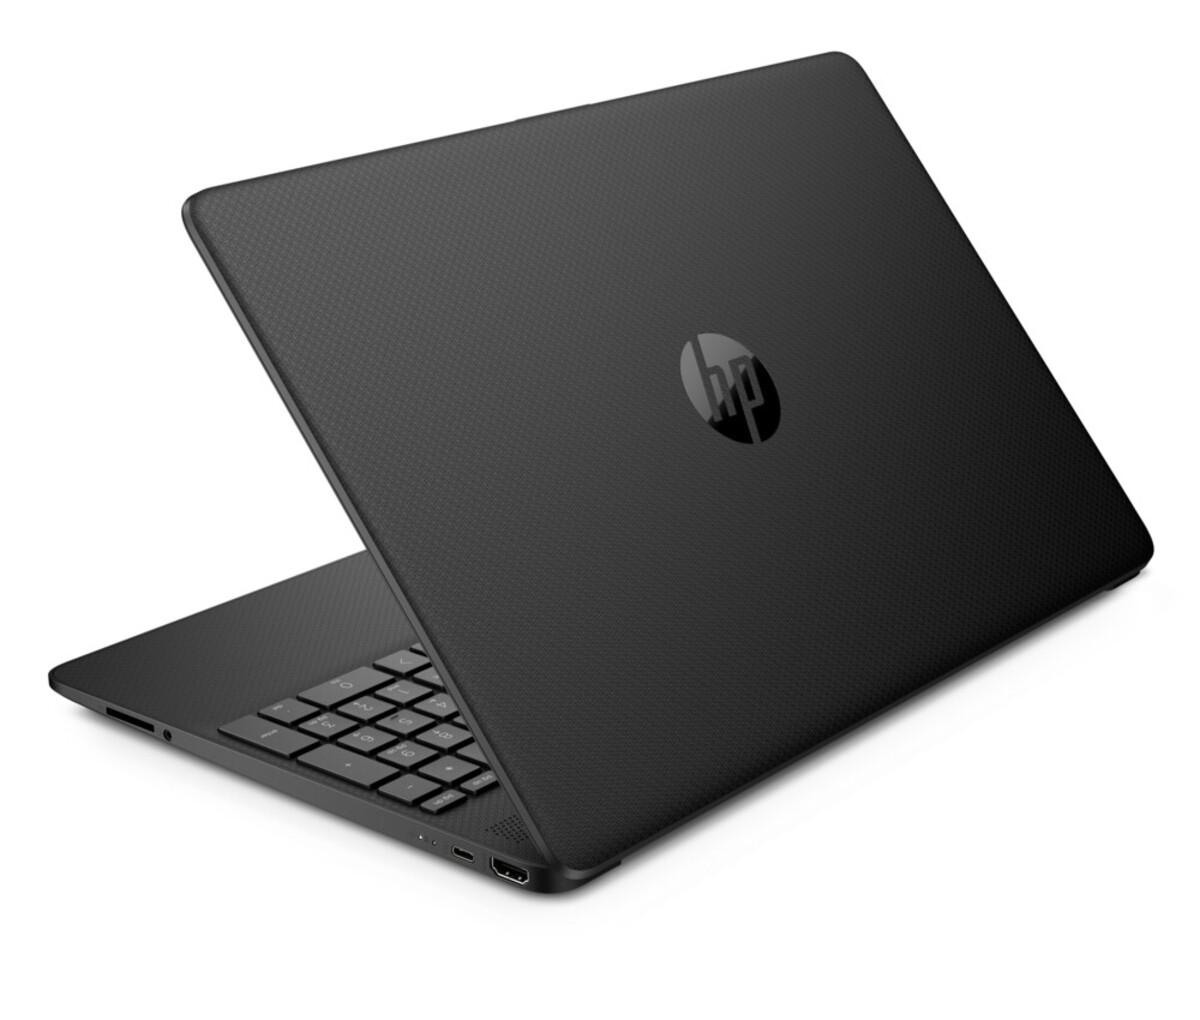 Bild 4 von HP 15s-eq2632ng schwarz Notebook (15,6 Zoll Full-HD (matt), Ryzen 5 5500U, 8 GB RAM, 512 GB SSD, AMD Radeon, Windows 10 Home)